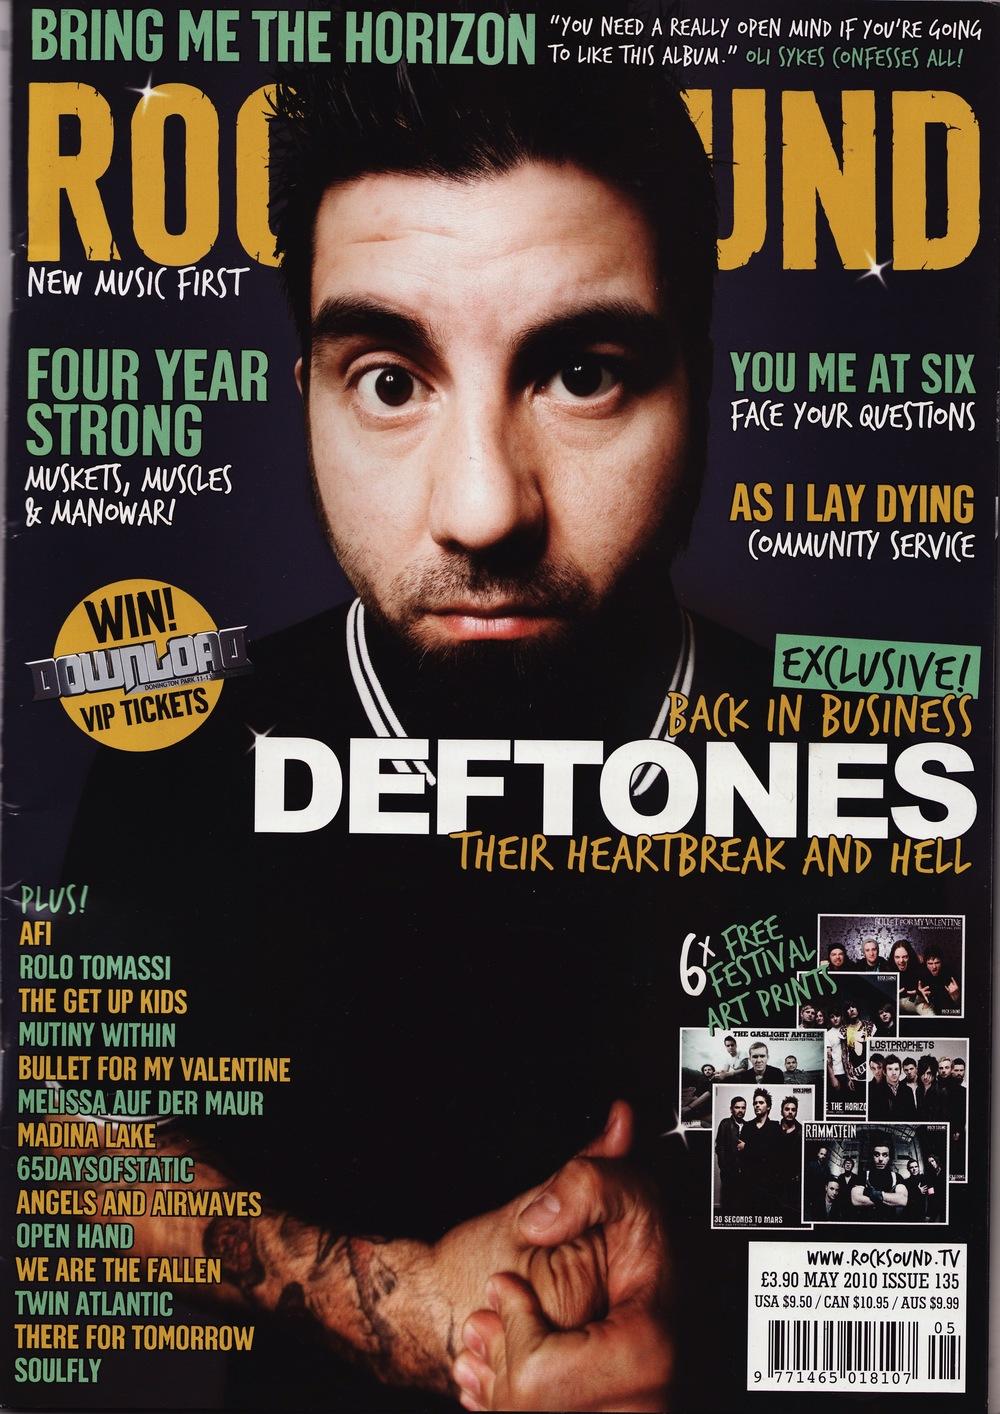 Deftones Rocksound.jpg